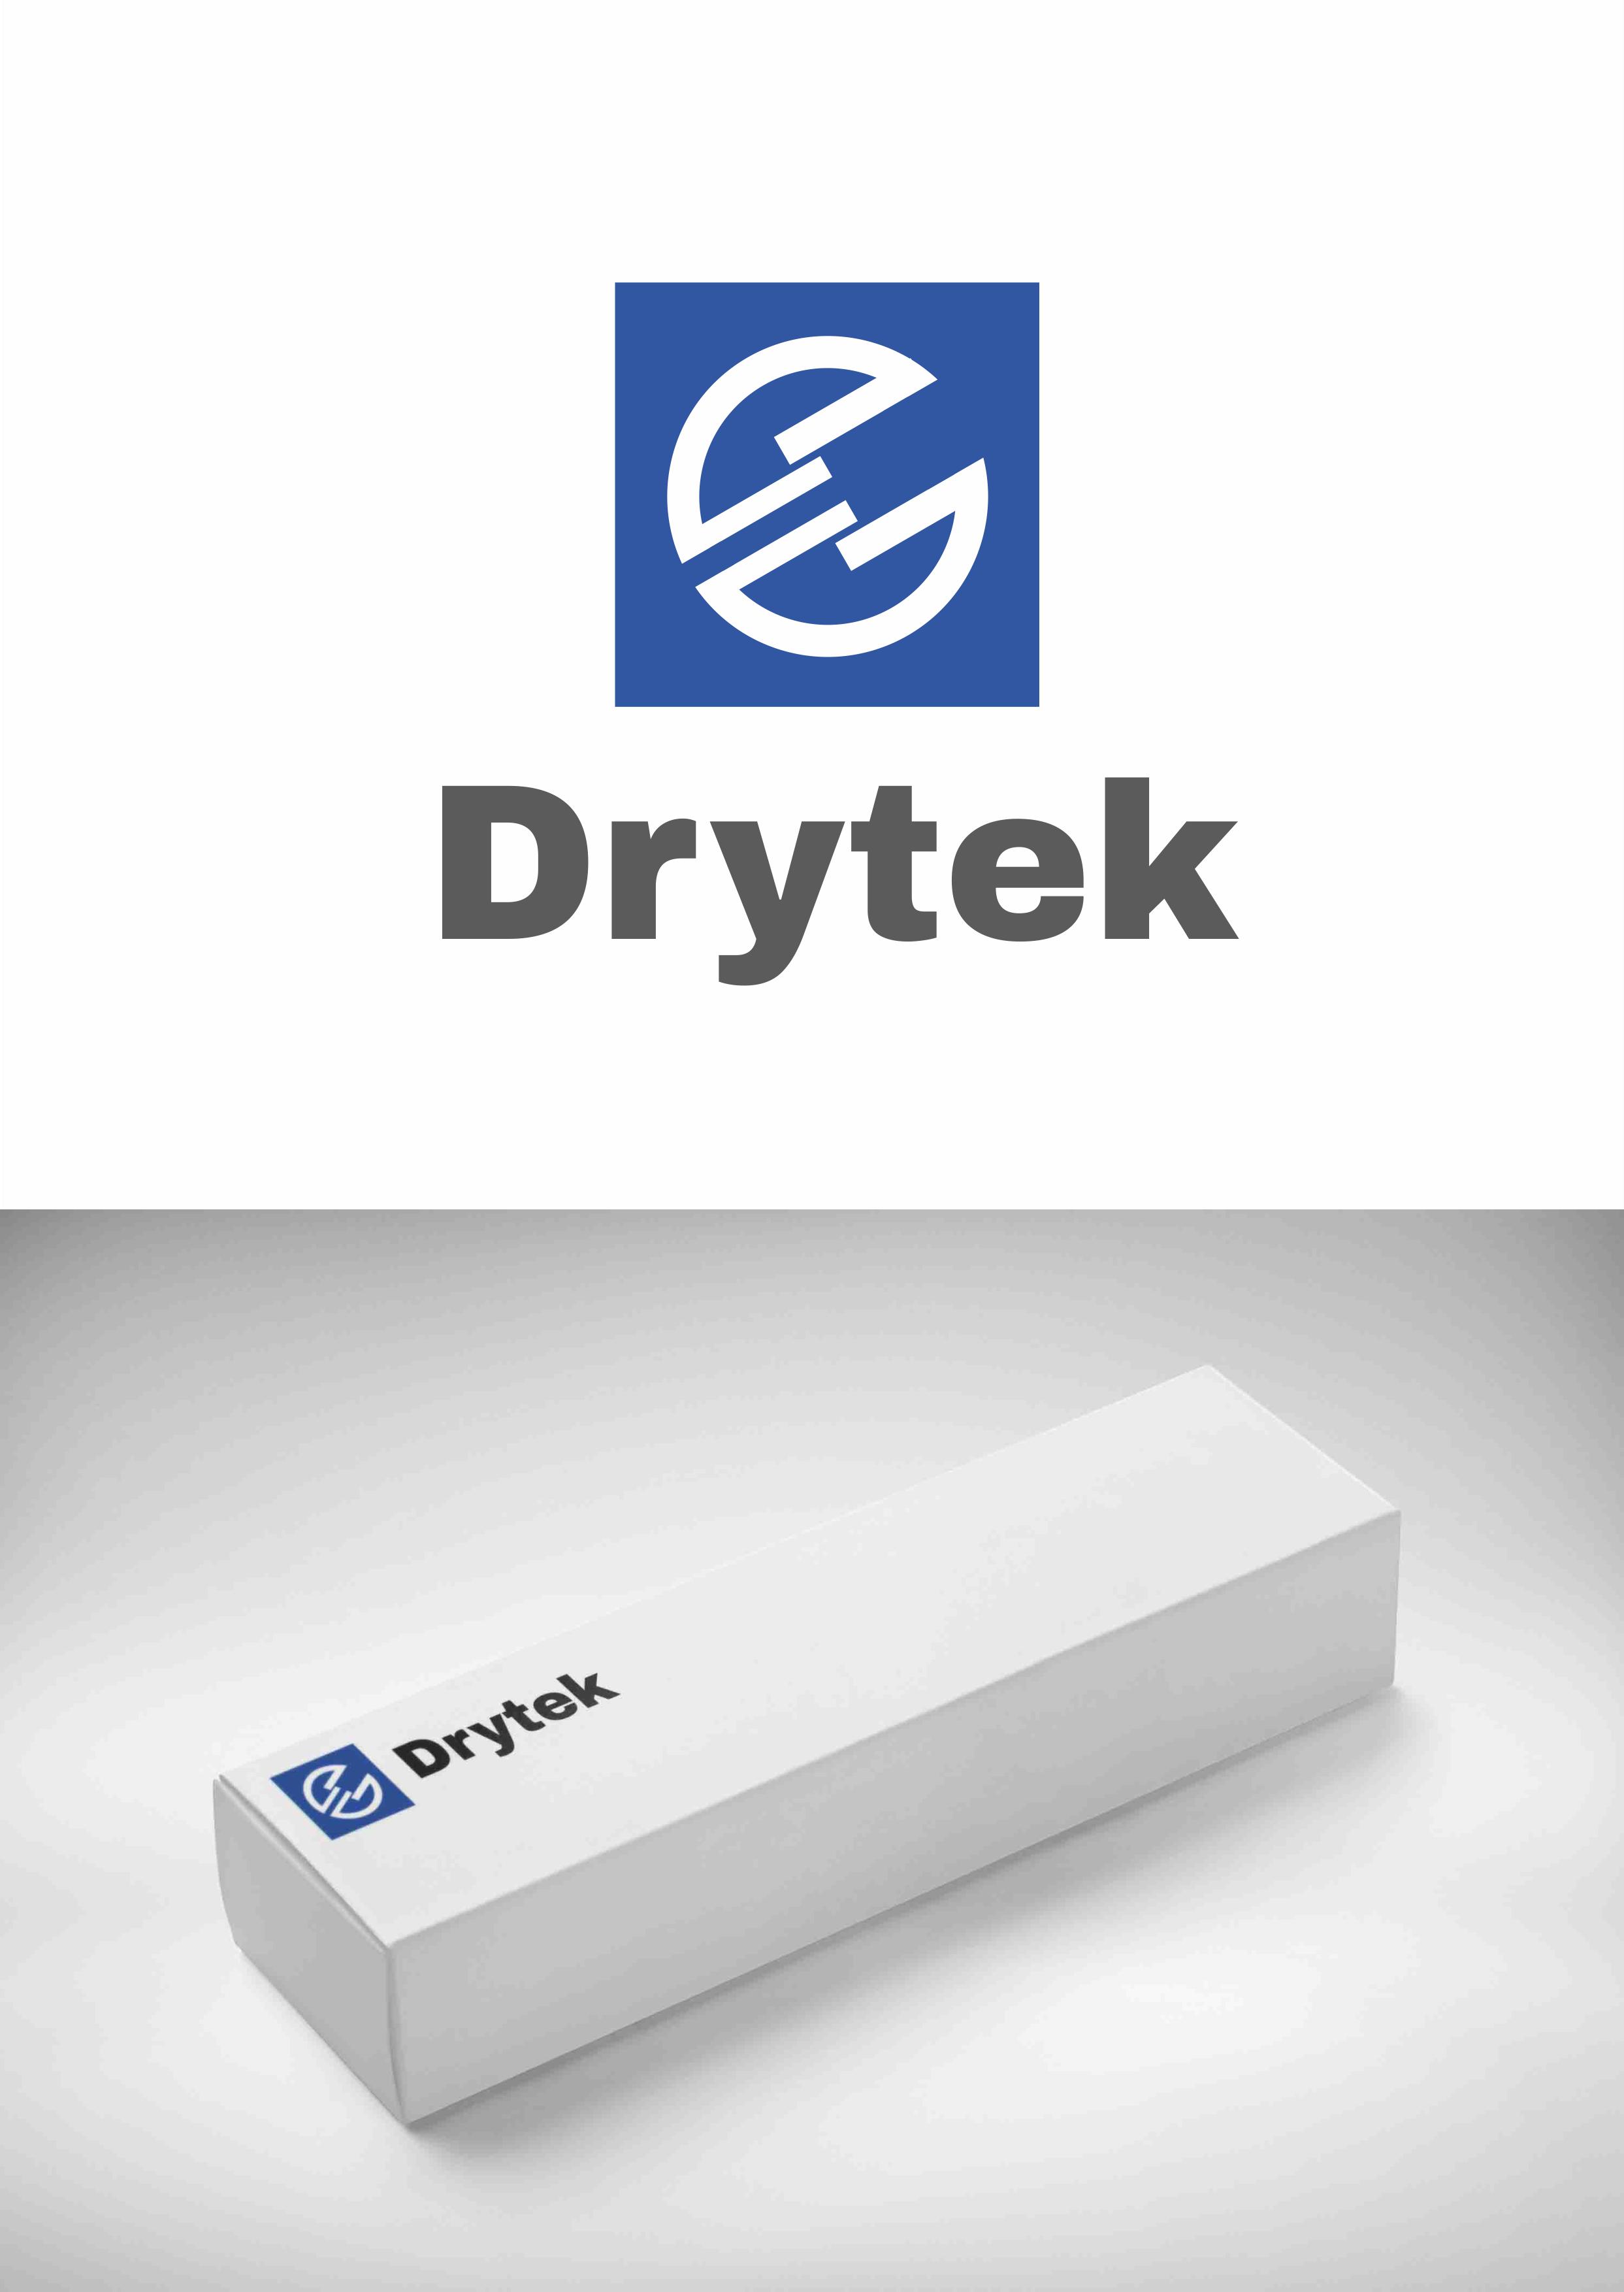 Создание логотипа для компании Drytek фото f_01859ba4fcd0d57d.png